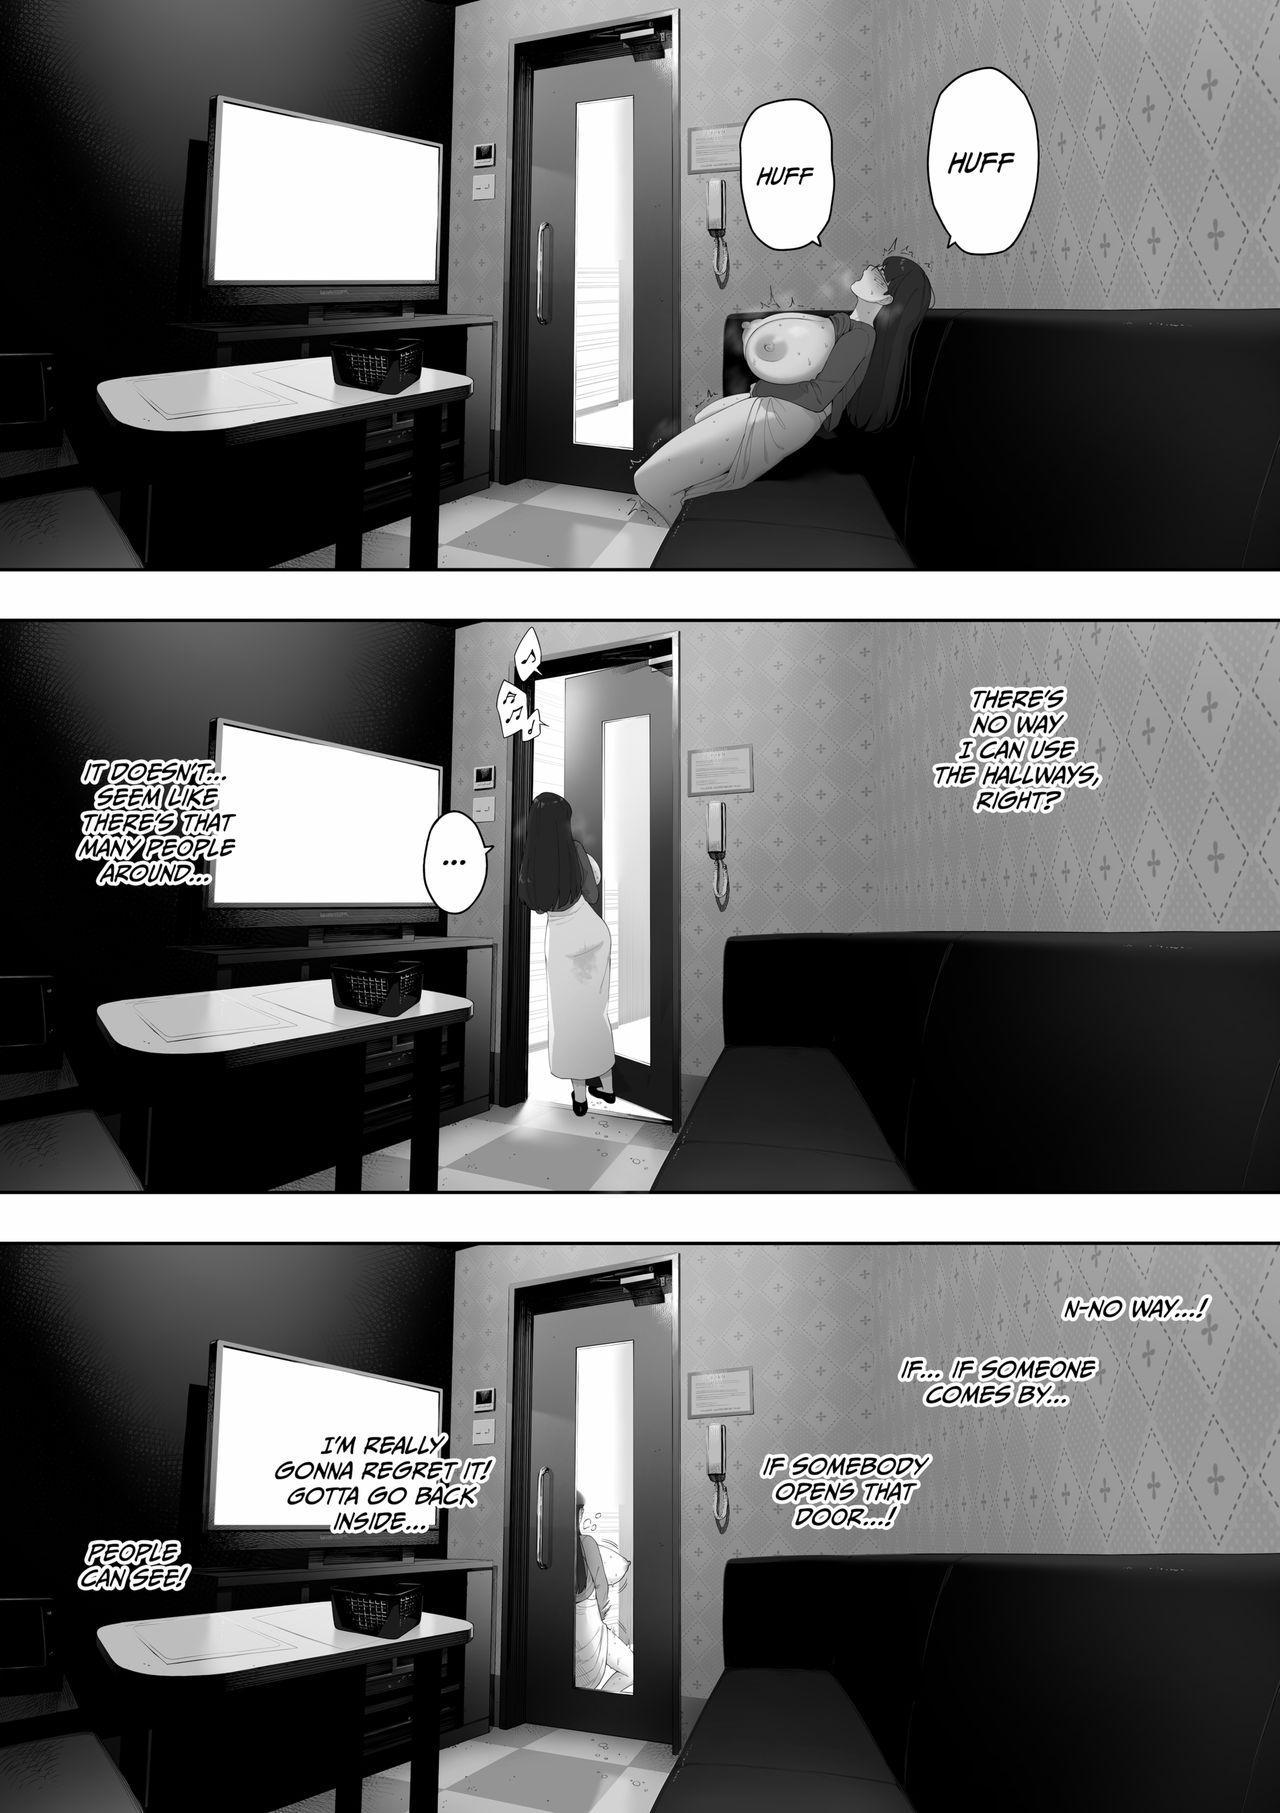 [NT Labo (NT Robo)] Aisai, Doui no Ue, Netorare Roshutsu | [NT Labo(NT Robo)] Cucked With_My Consent My Exhibitionist Wife [English] 39